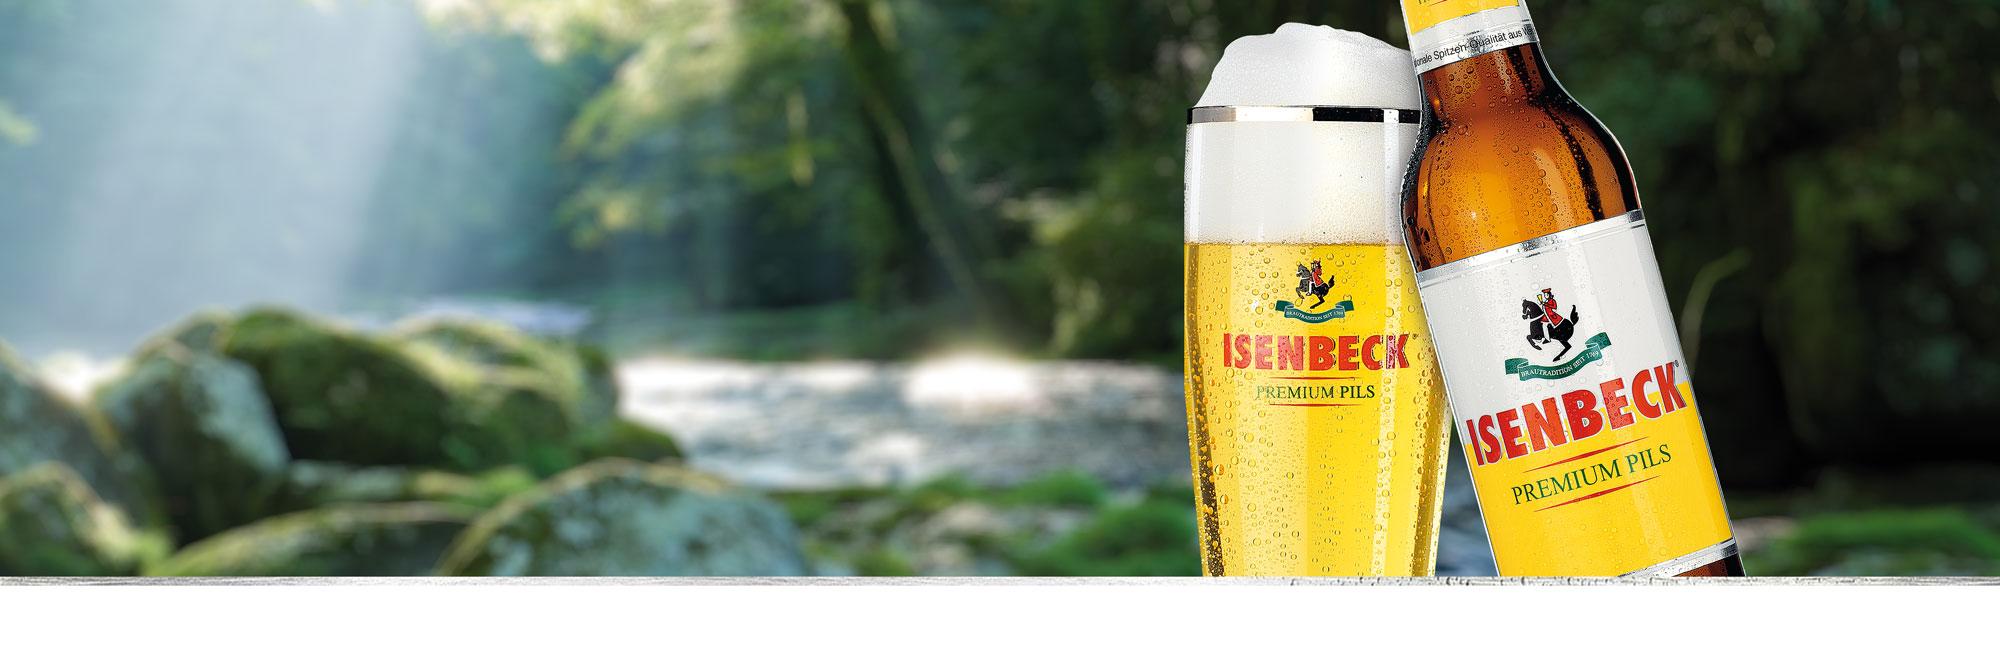 Isenbeck Produkt und Sortiment